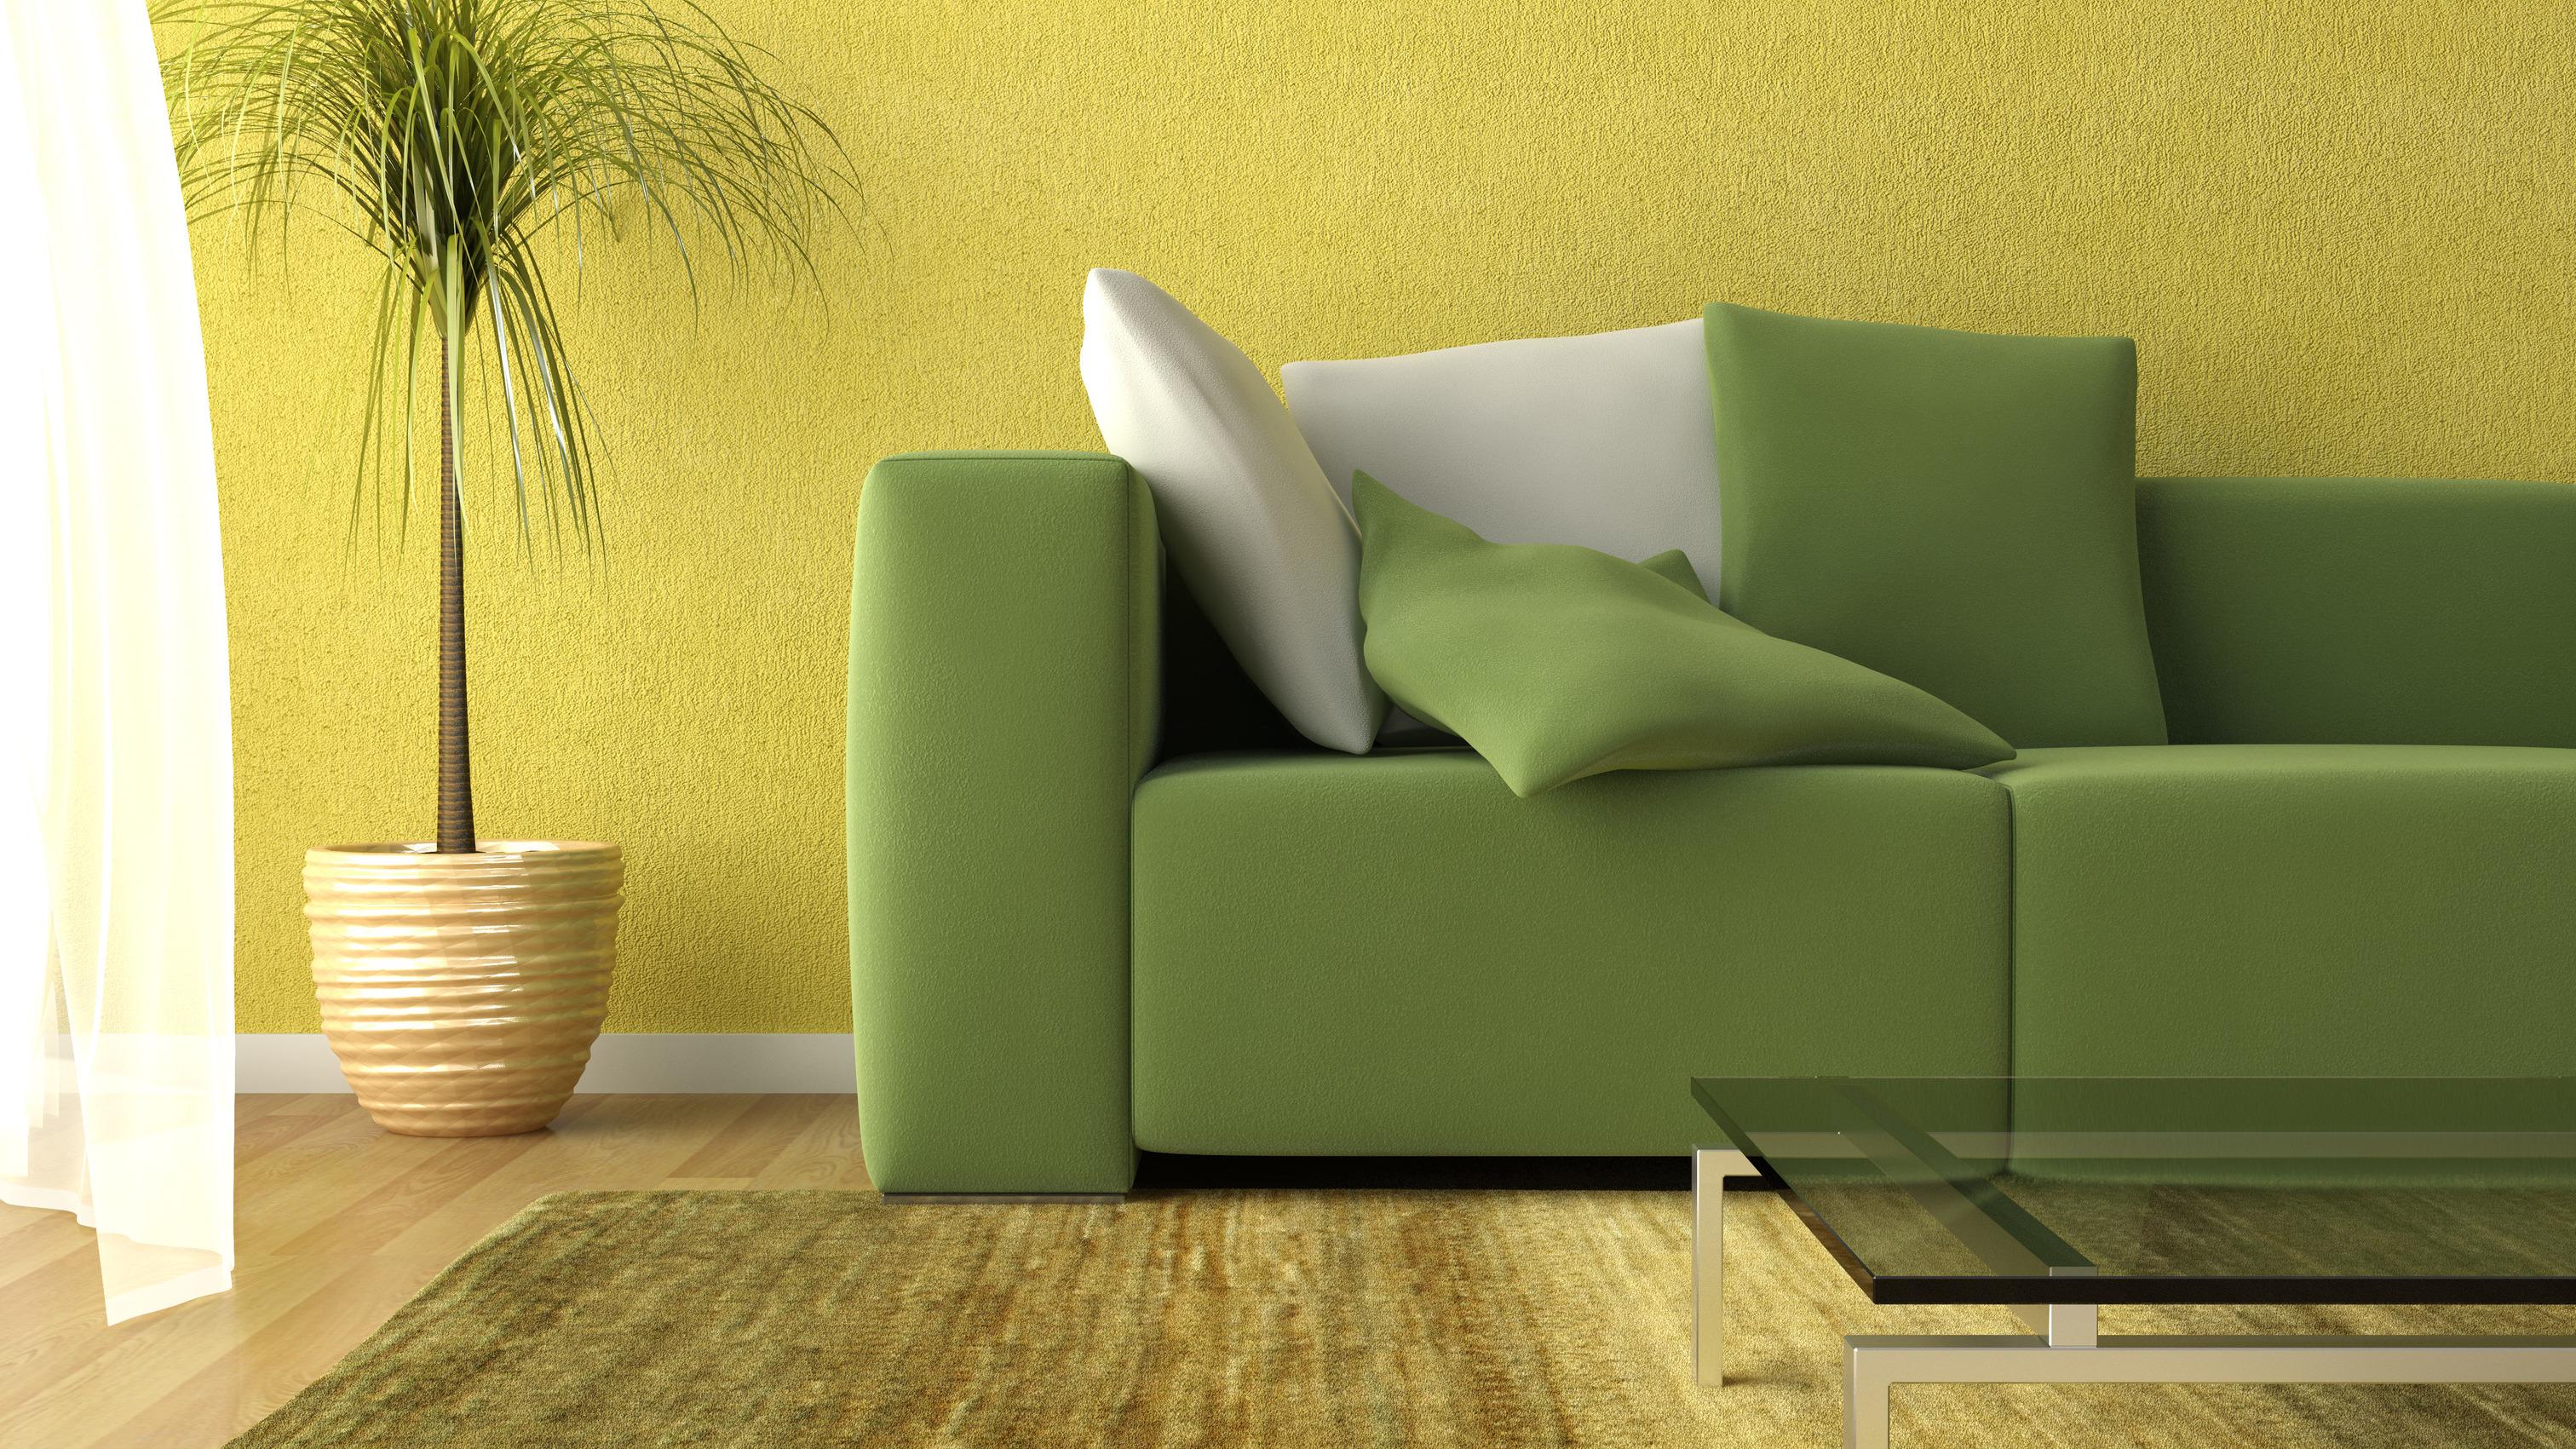 Baunet – roheline diivan FI